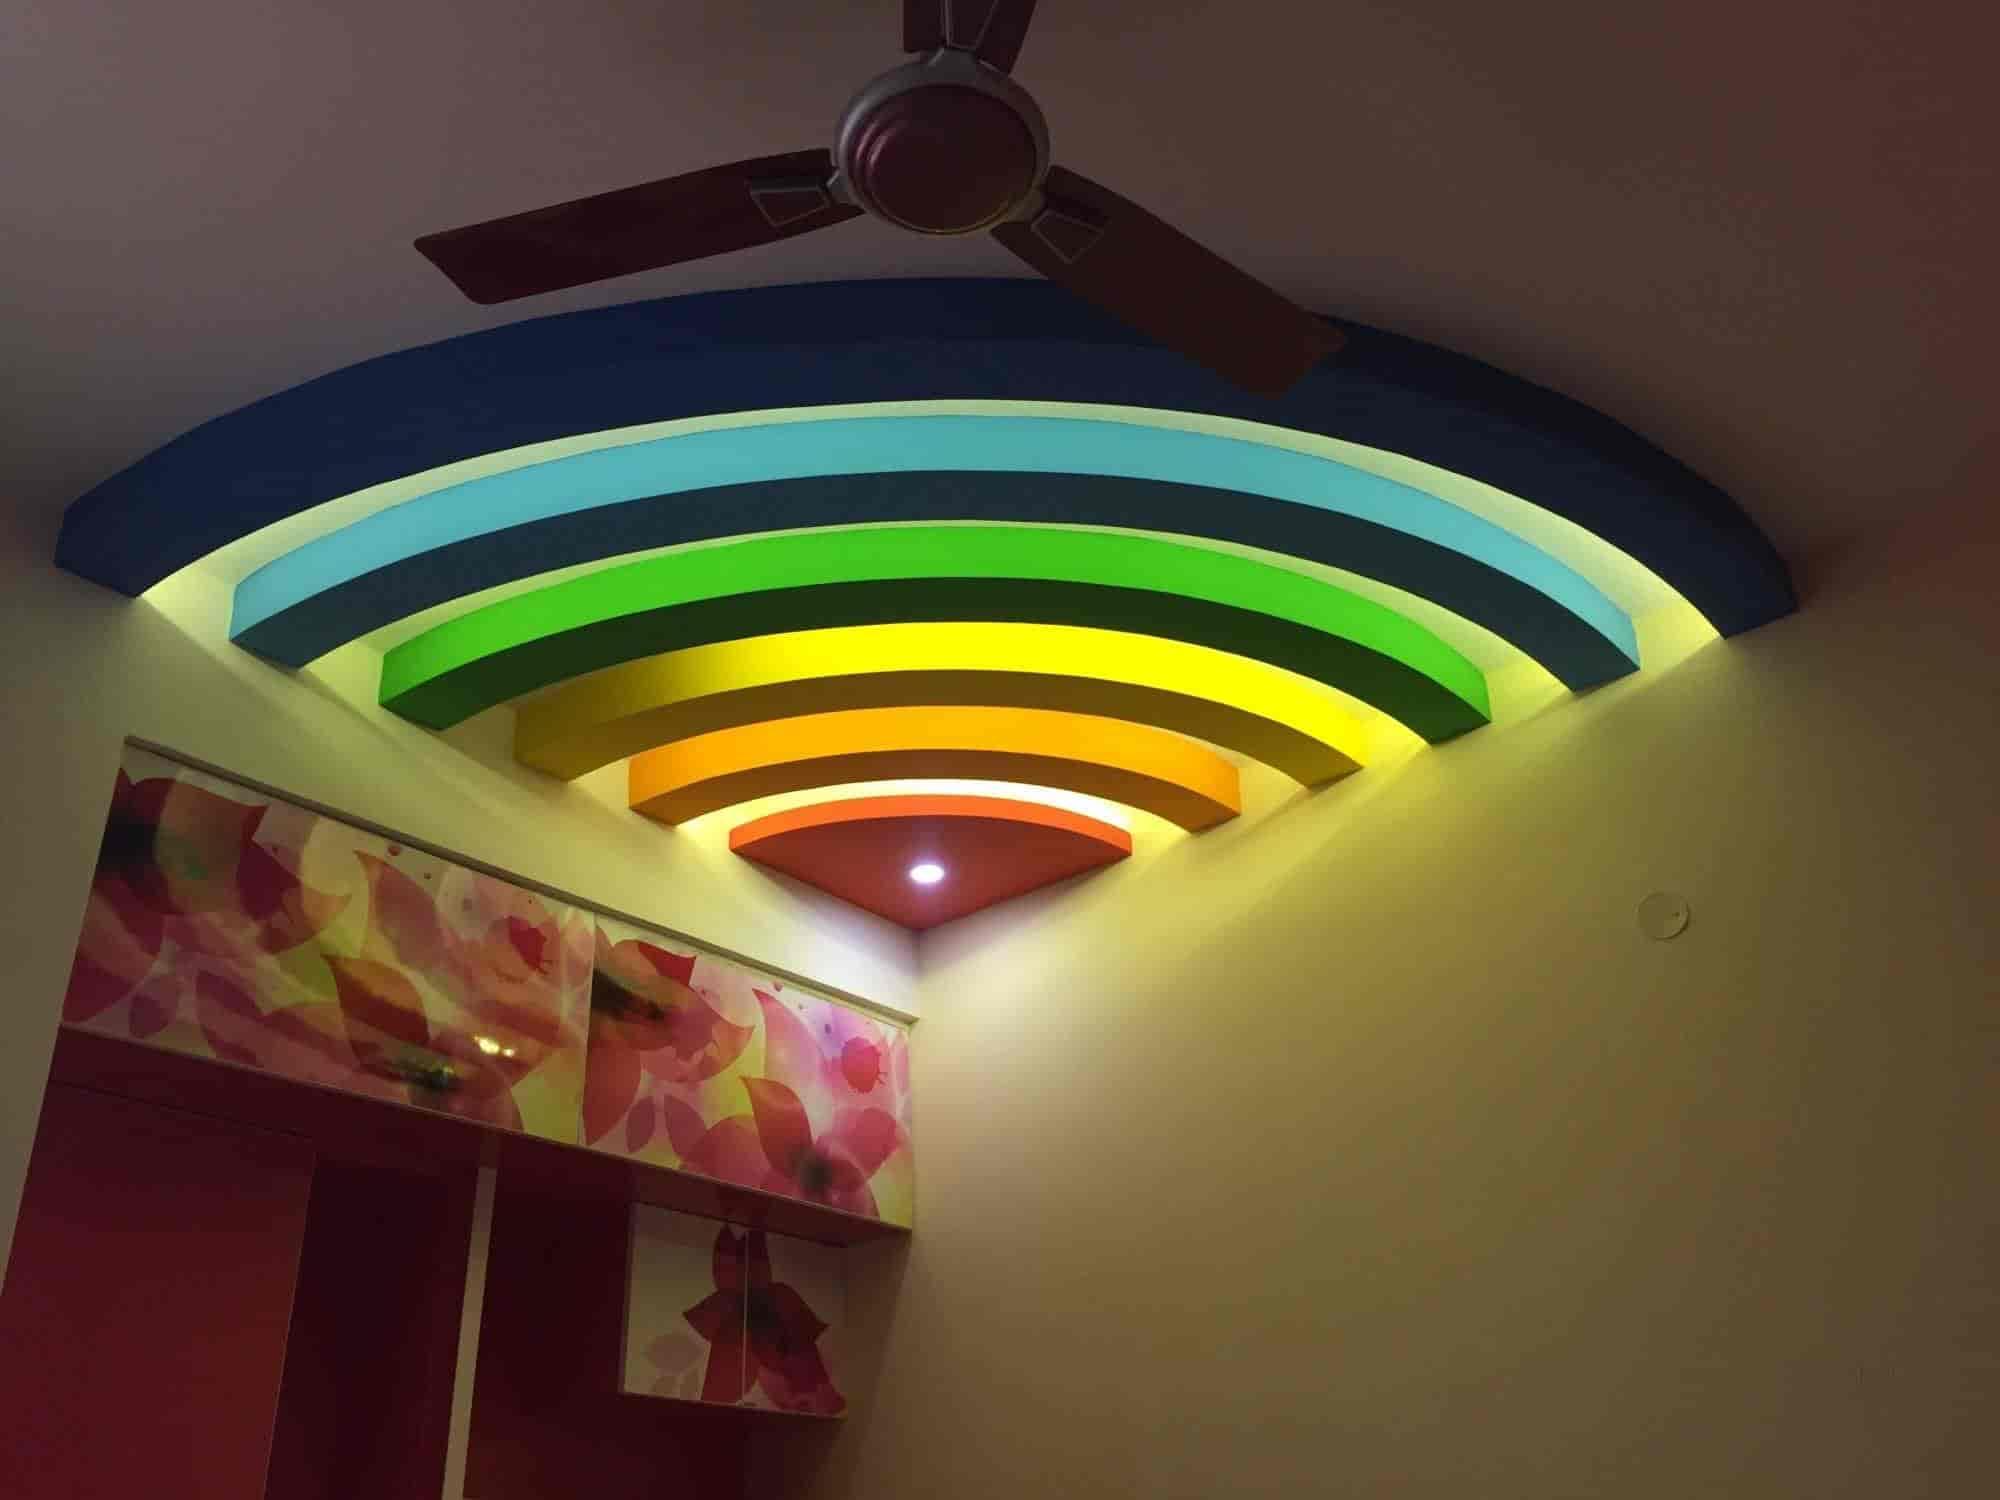 Ceiling Design, Mysore Road - False Ceiling Contractors in Bangalore -  Justdial